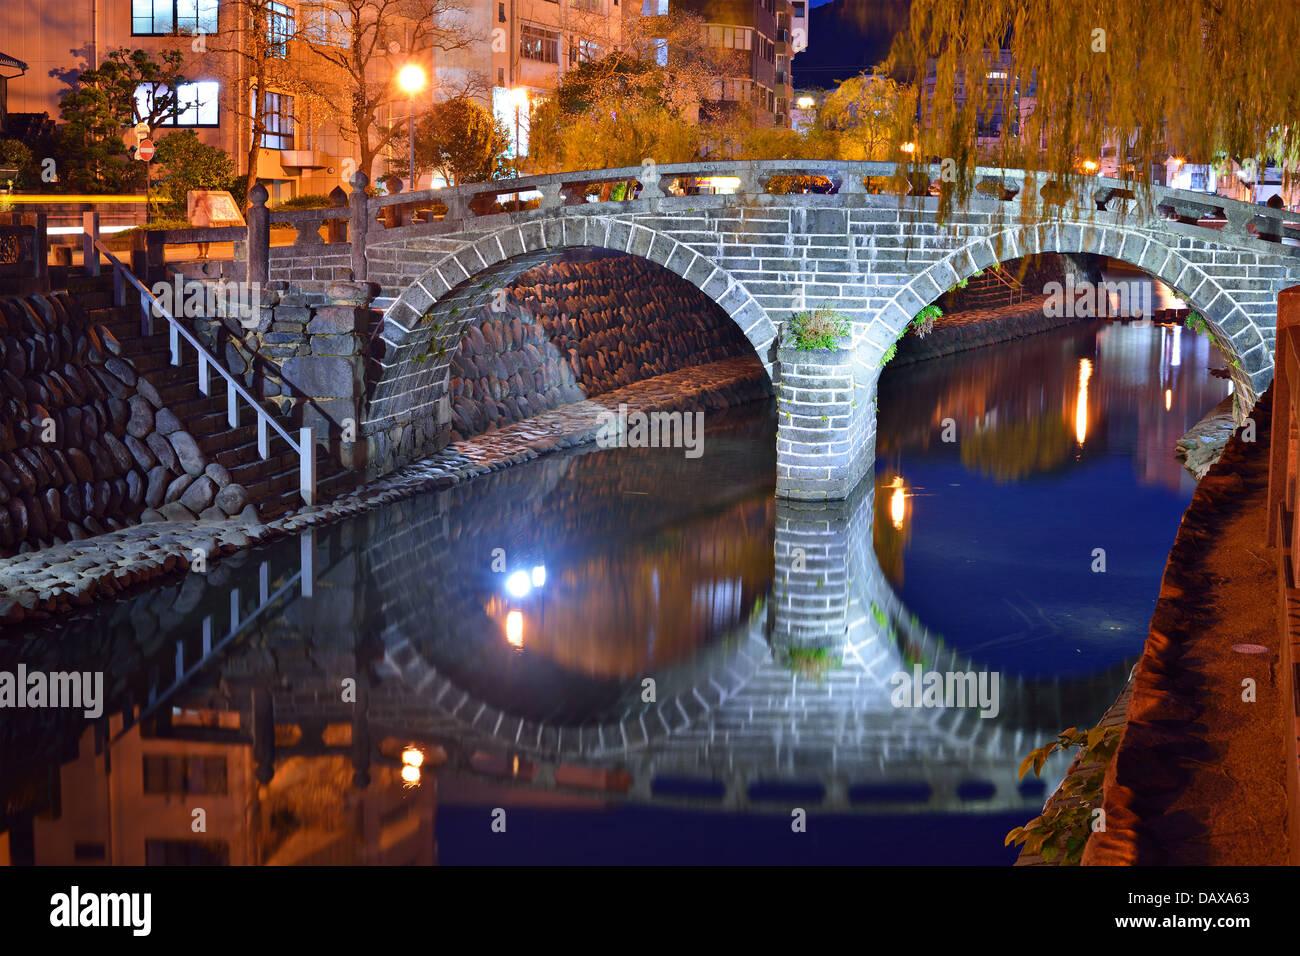 Nagasaki, Japan at the historic Megane 'Spectacles' Bridge. - Stock Image